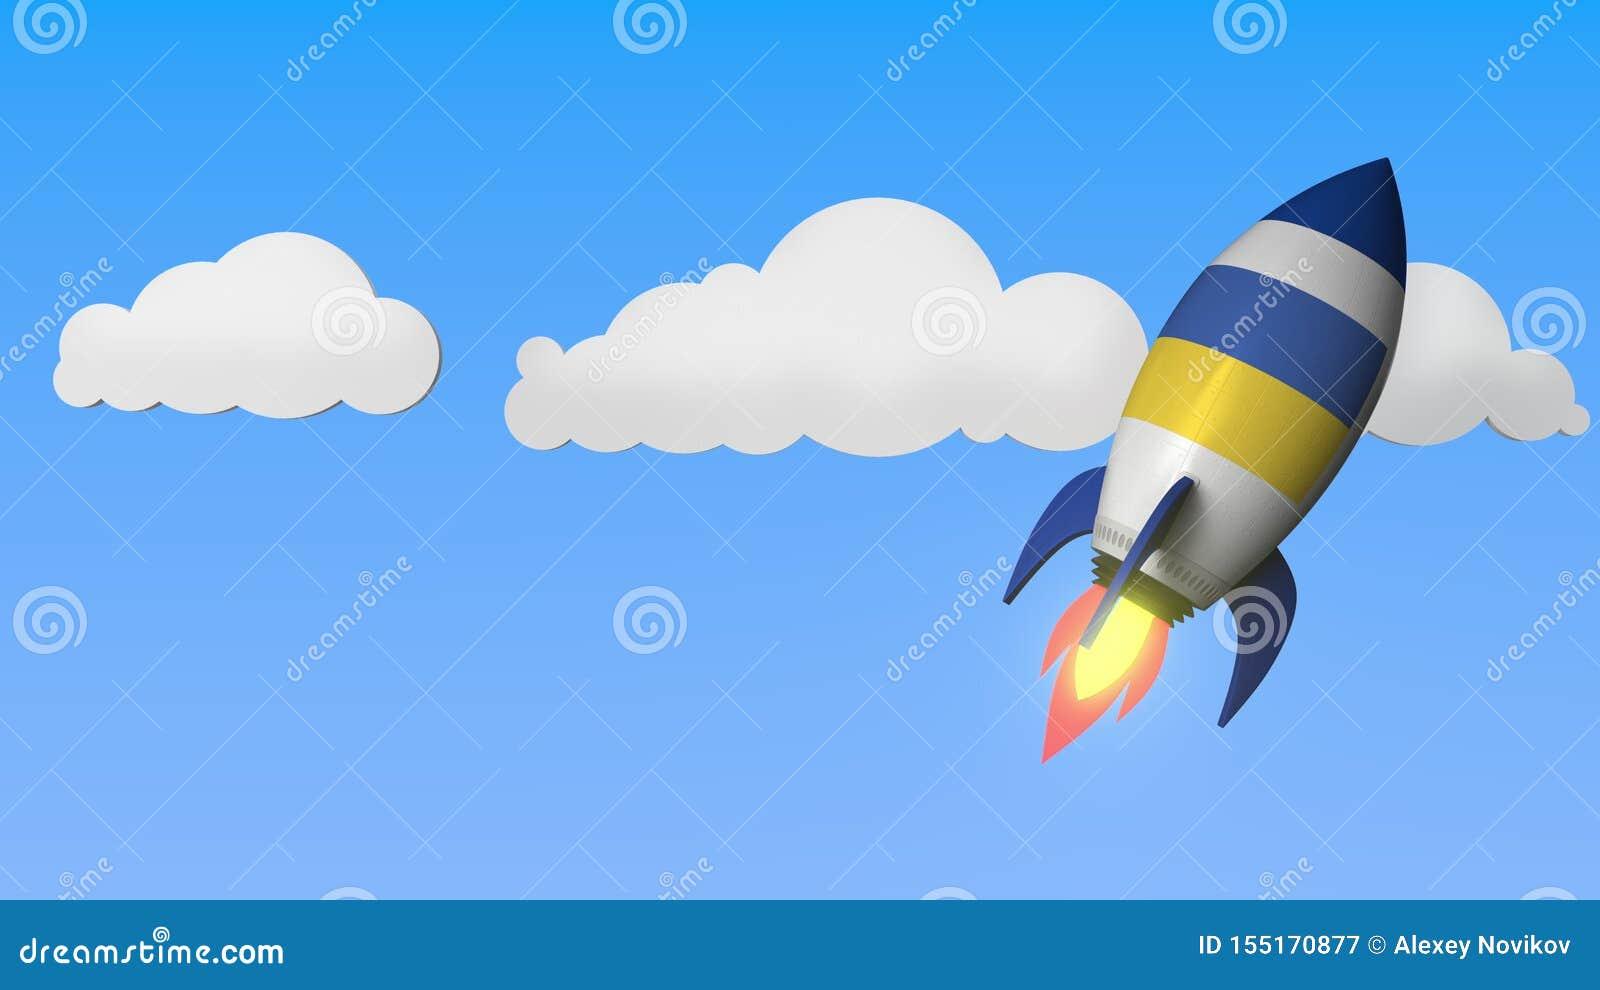 Rocket with flag of Ukraine flies in the sky. Ukrainian success or space program related 3D rendering